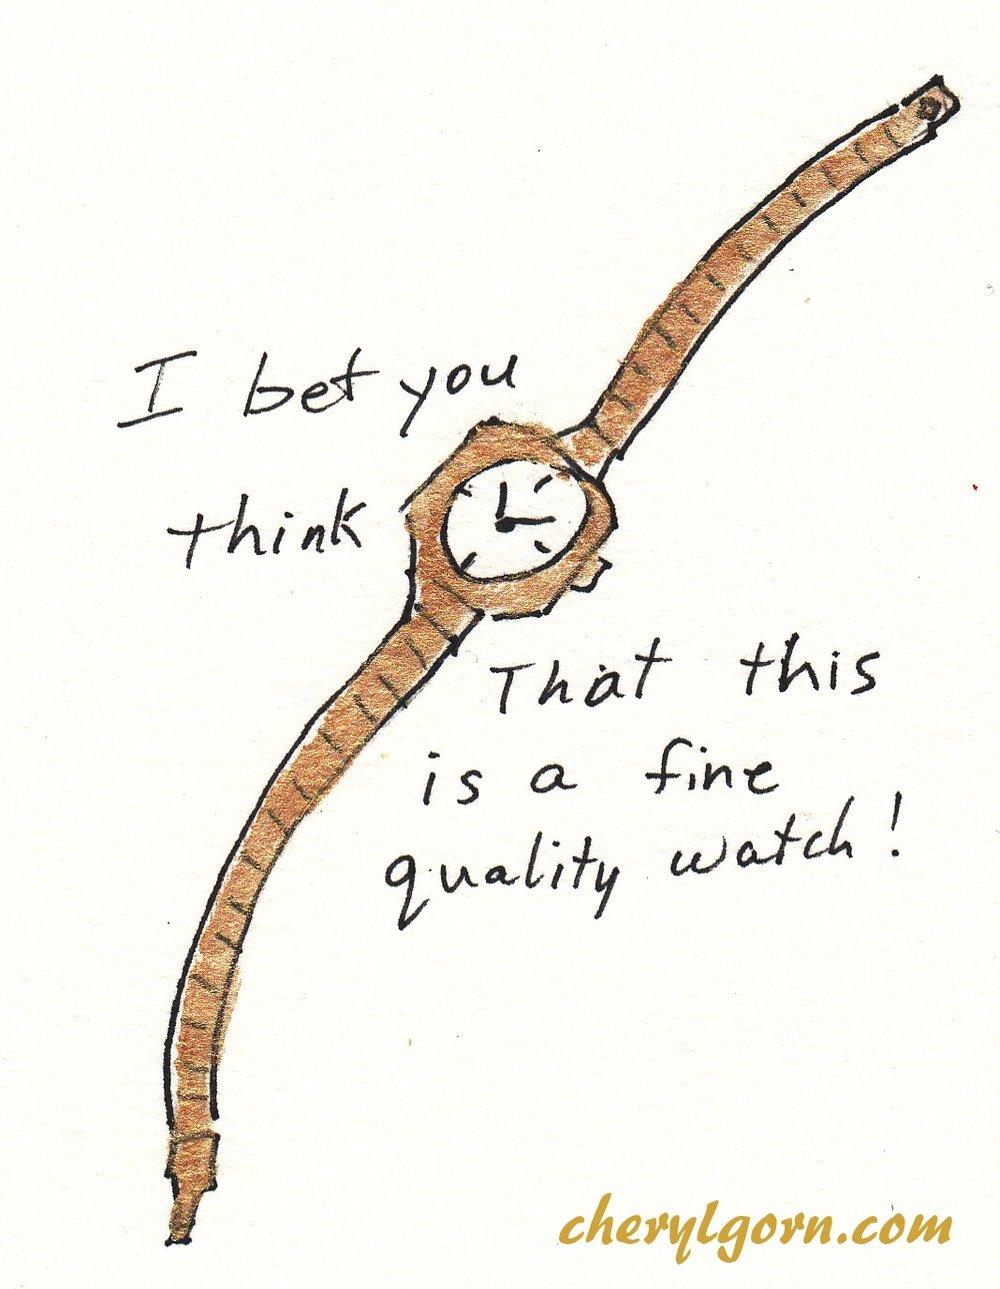 cheap_watch.jpg